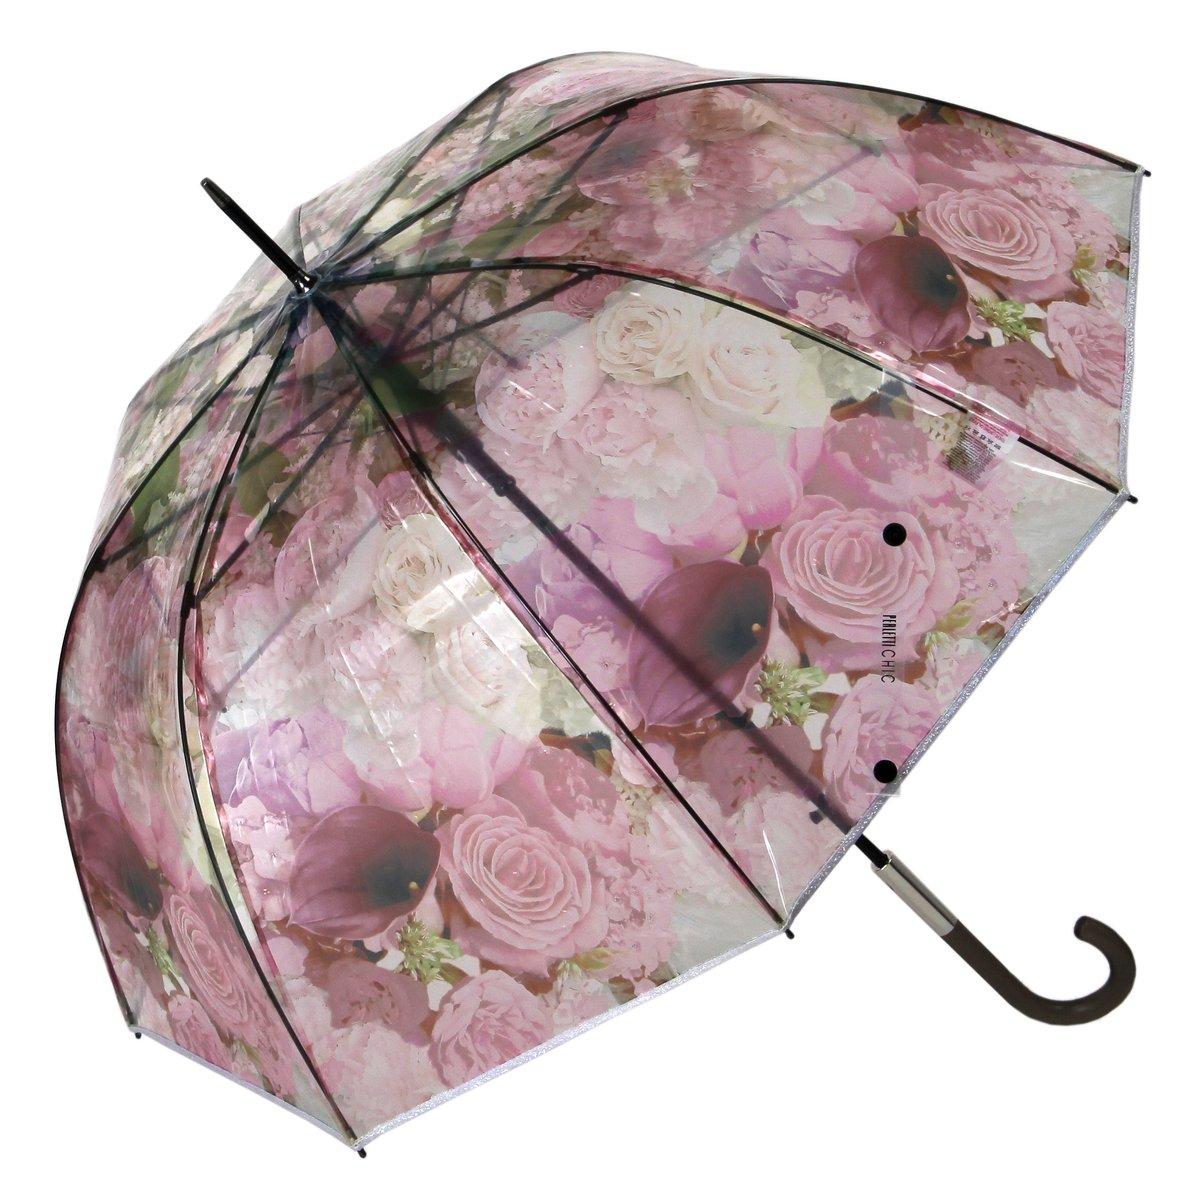 Perletti Transparentschirm Glockenschirm Flowers